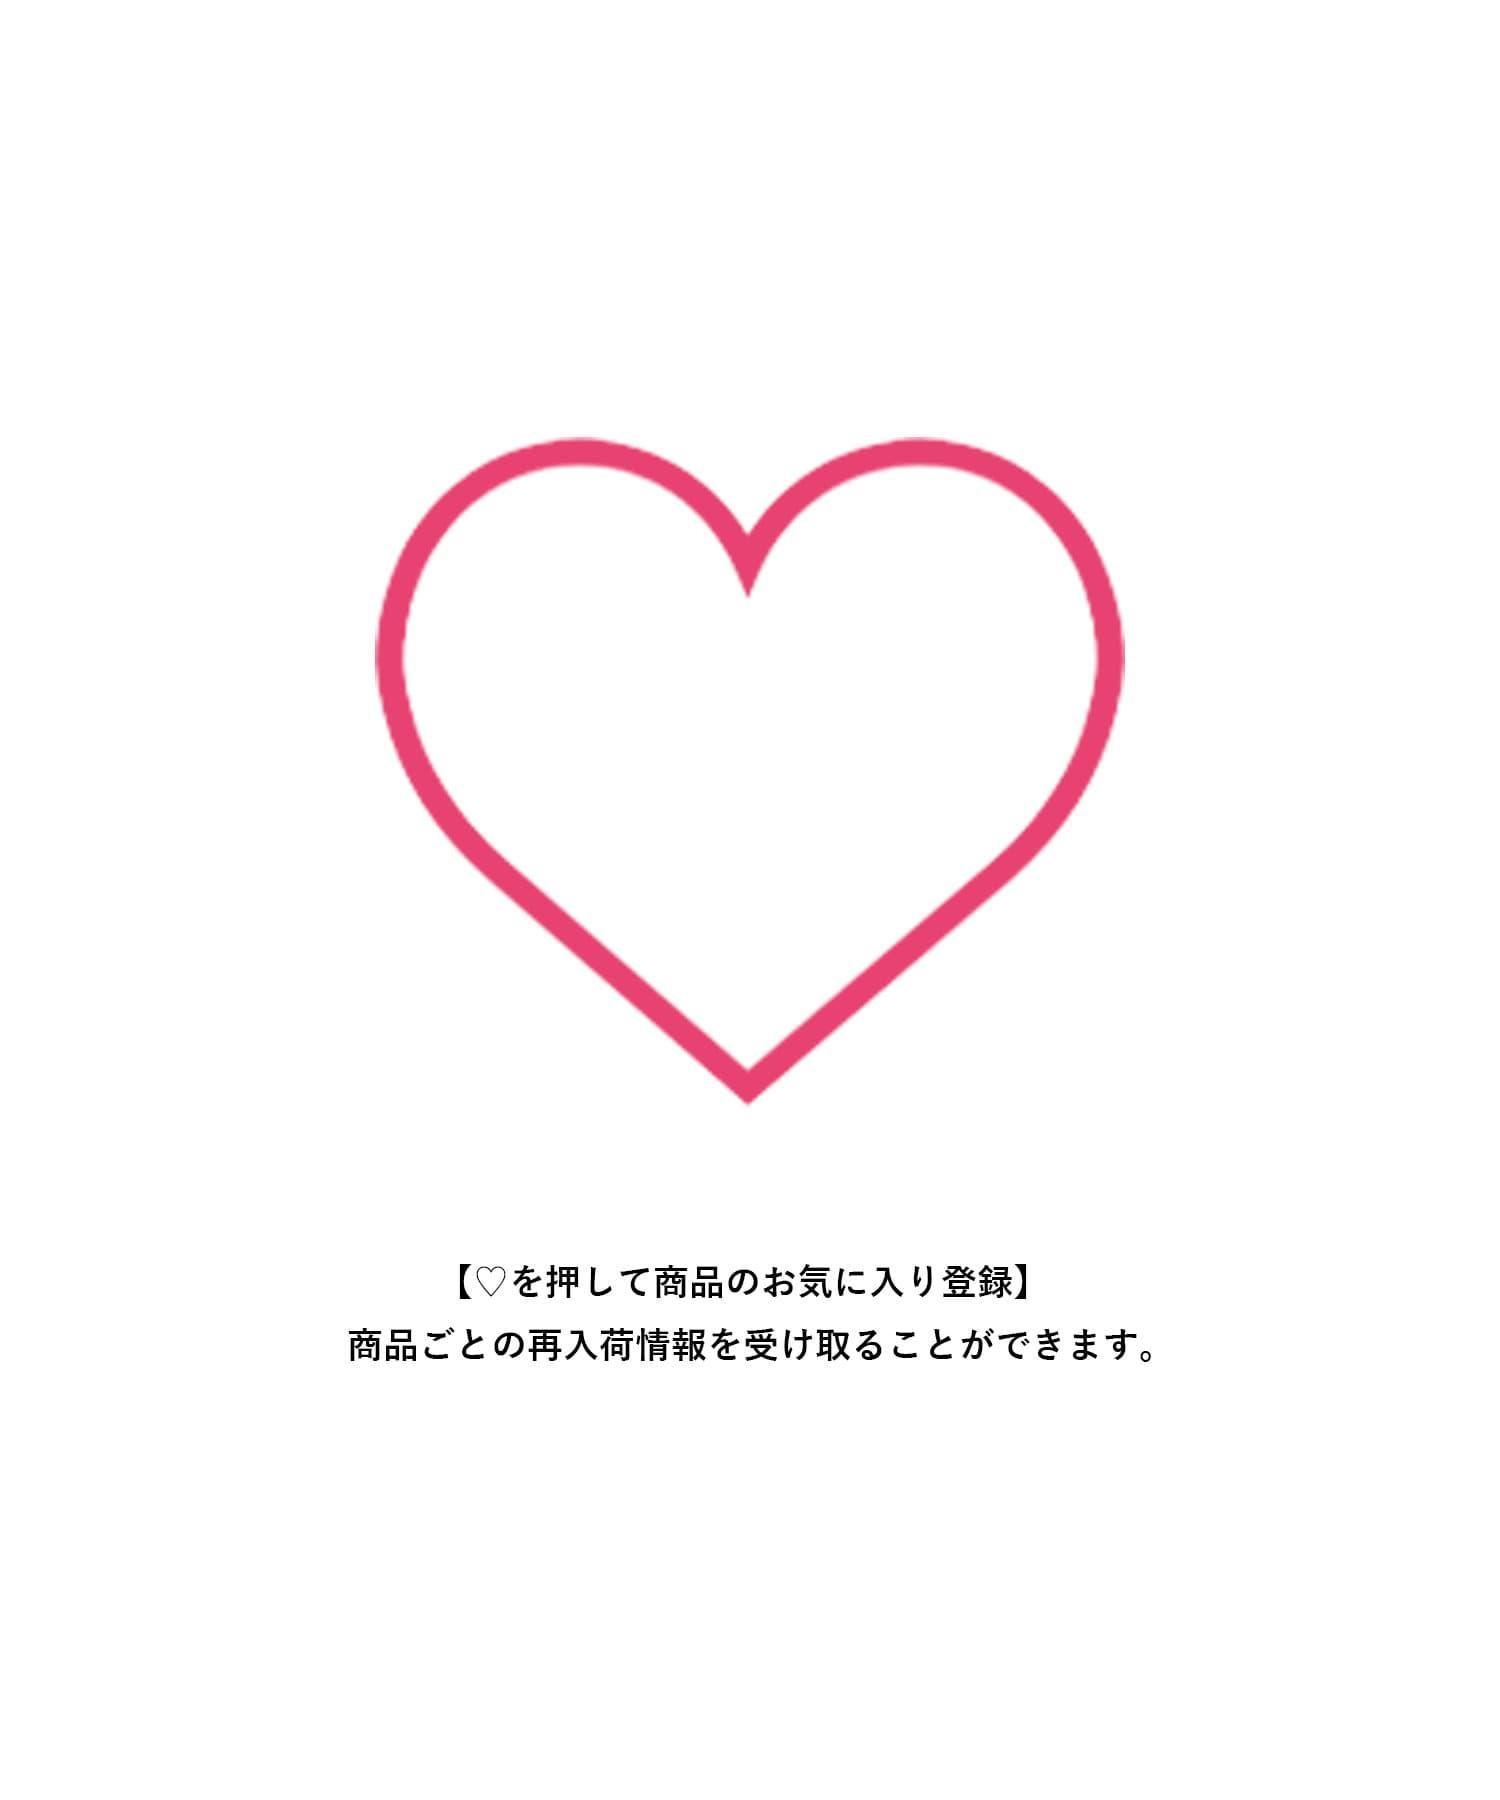 COLLAGE GALLARDAGALANTE(コラージュ ガリャルダガランテ) 【美脚力No.1】ストレートデニム